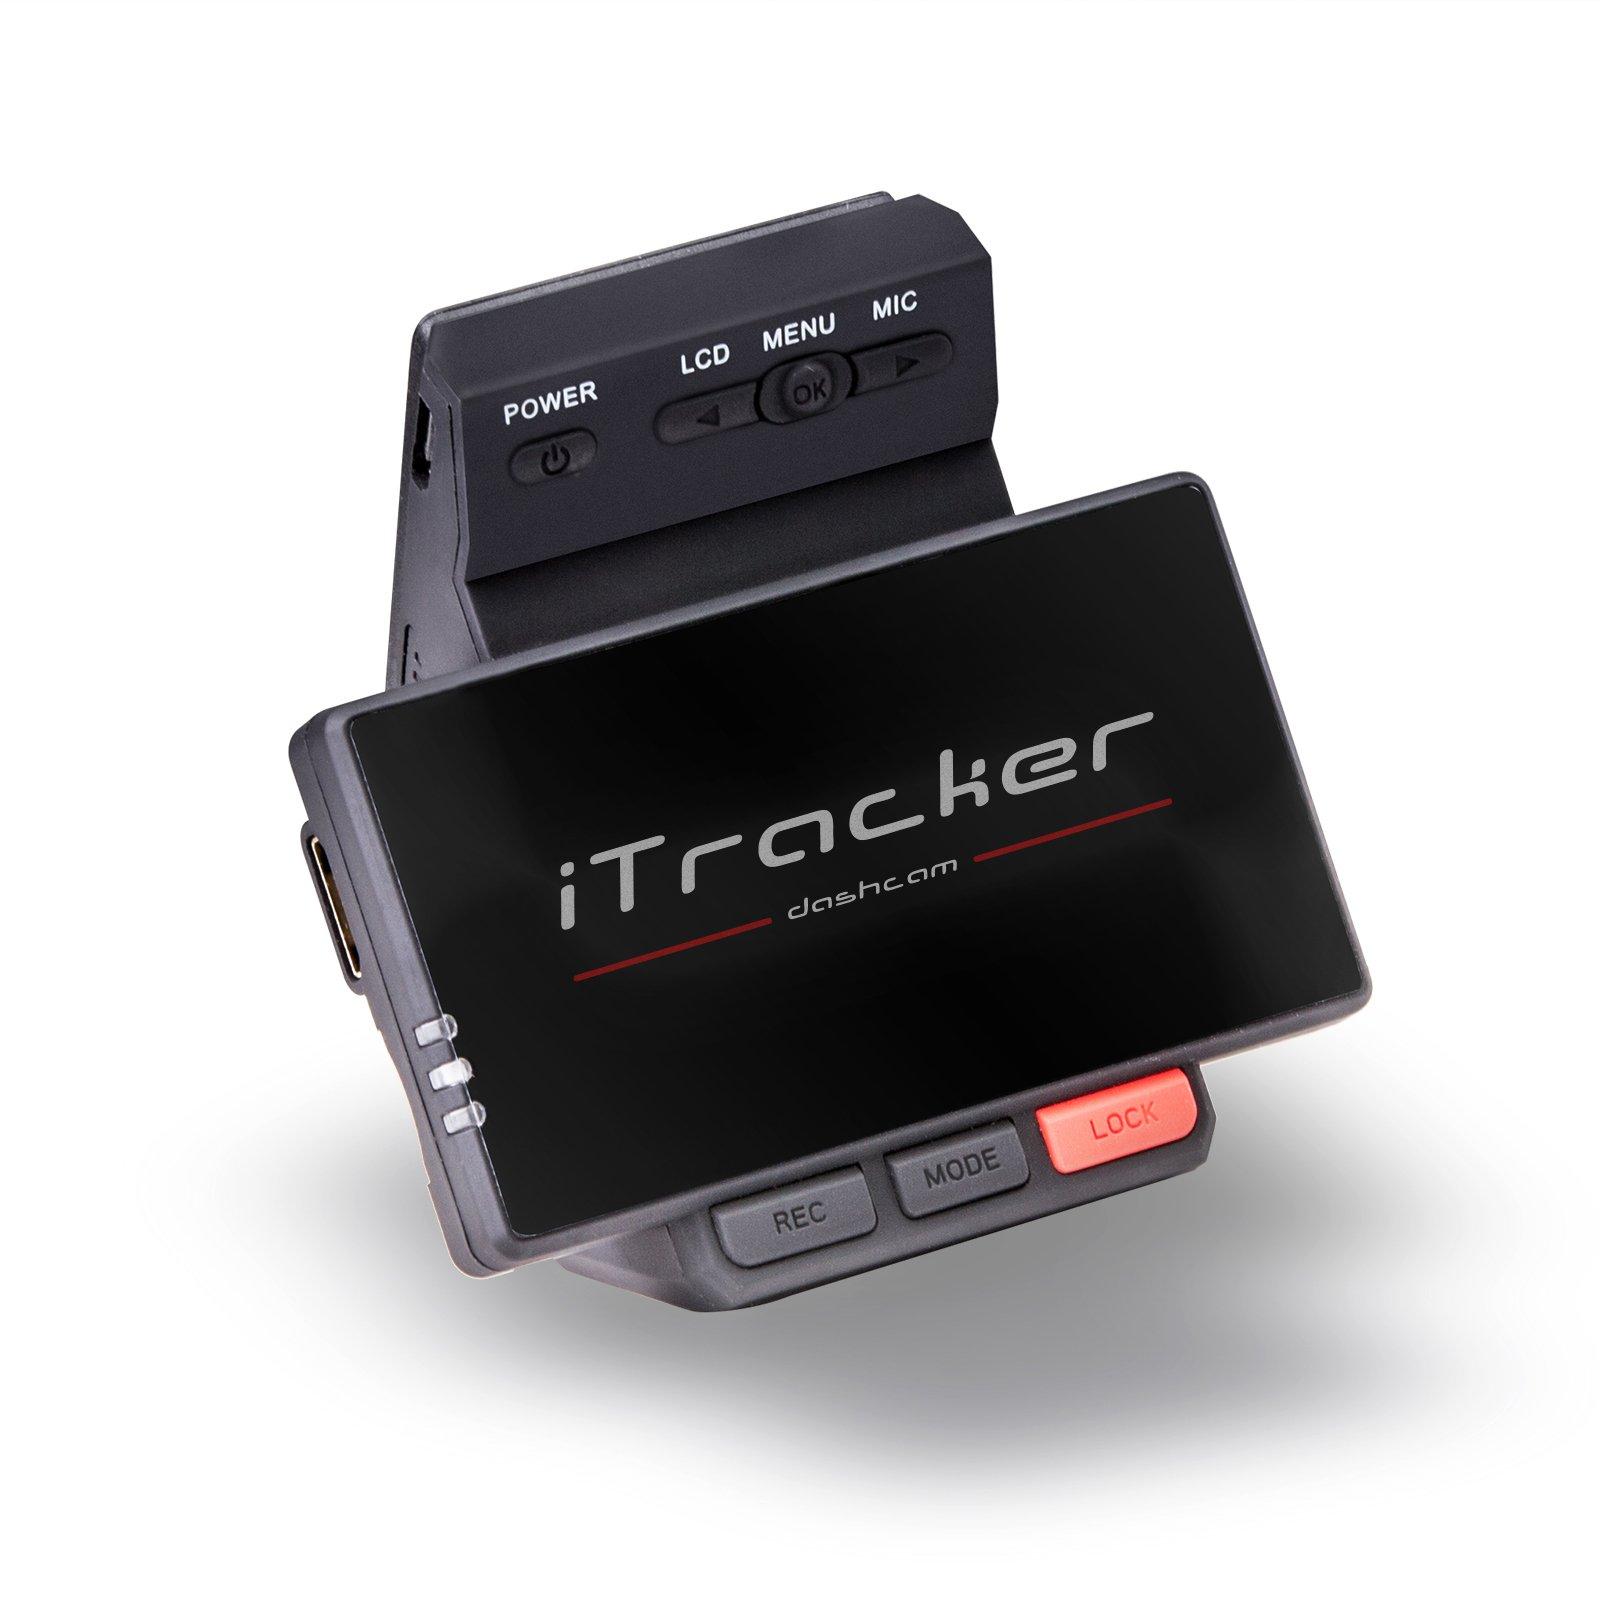 iTracker-Stealthcam-GPS-Autokamera-mit-Full-HD-GPS-Dashcam-15Mbits-Bitrate-Dash-Cam